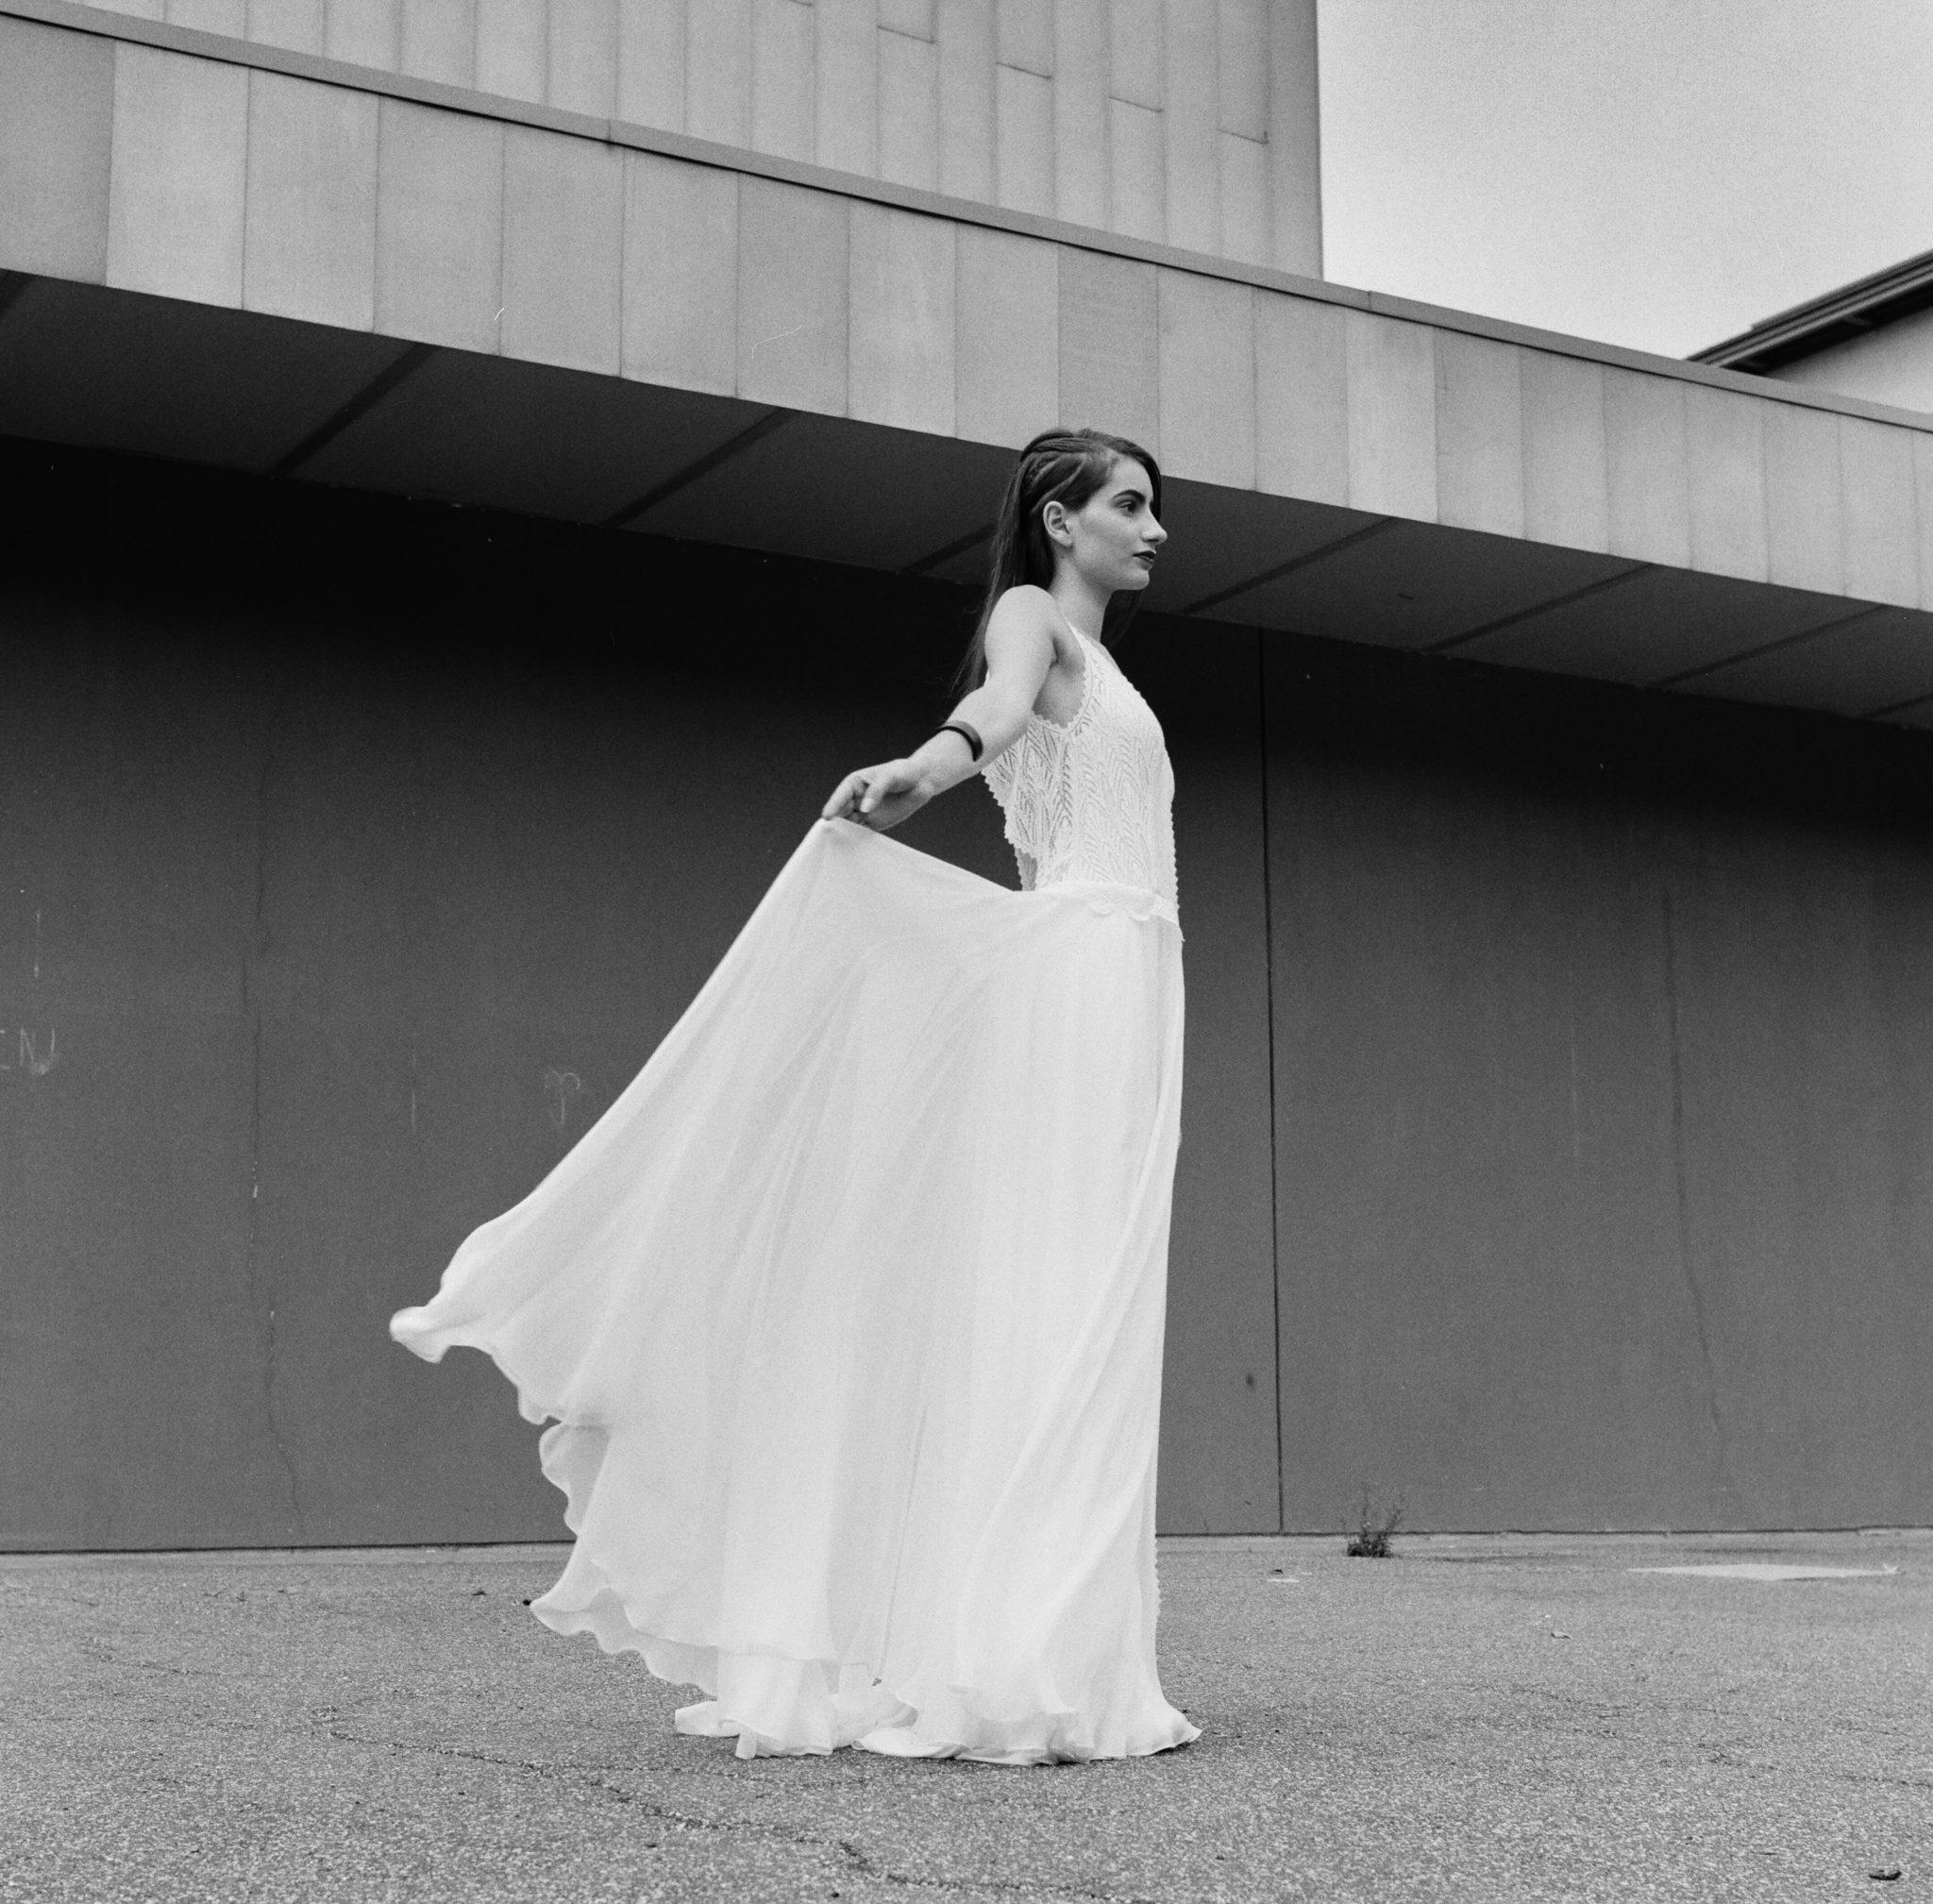 Le Wedding Urban Brides robe Amarildine bracelet Ginette NY Presqu'île le Cargo Caen